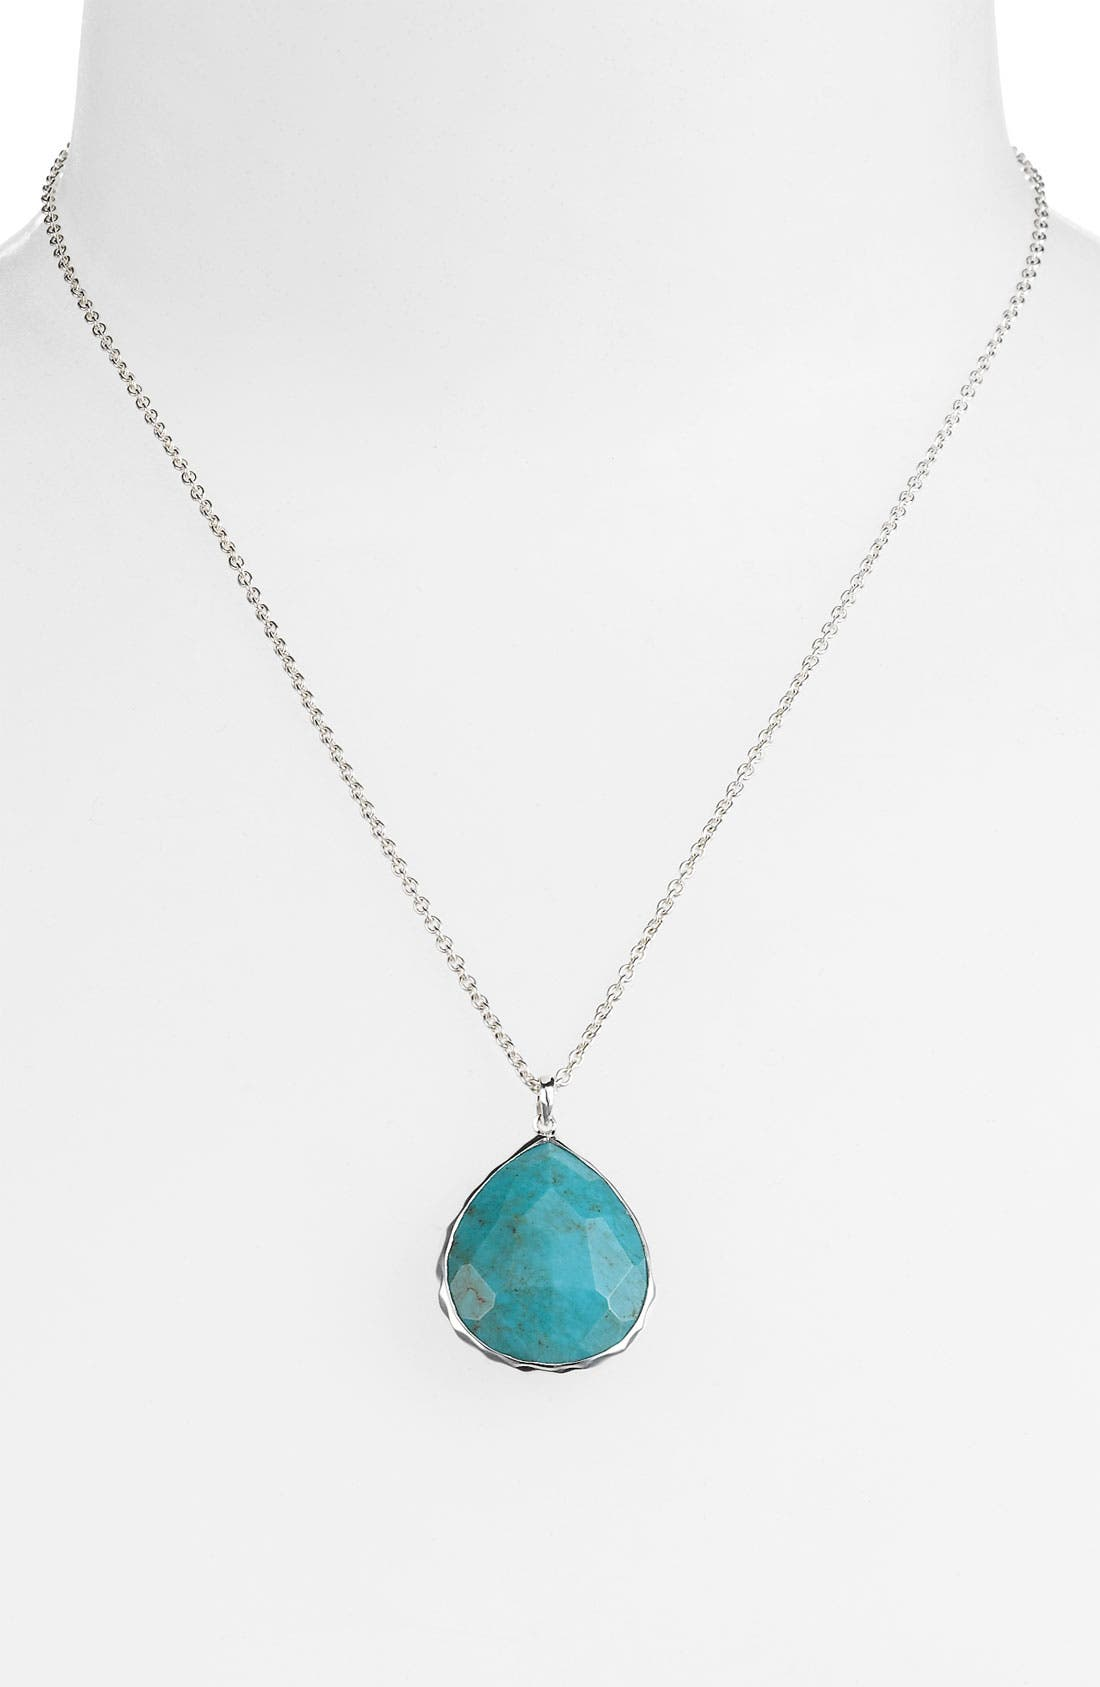 Alternate Image 1 Selected - Ippolita 'Rock Candy' Large Teardrop Pendant Necklace